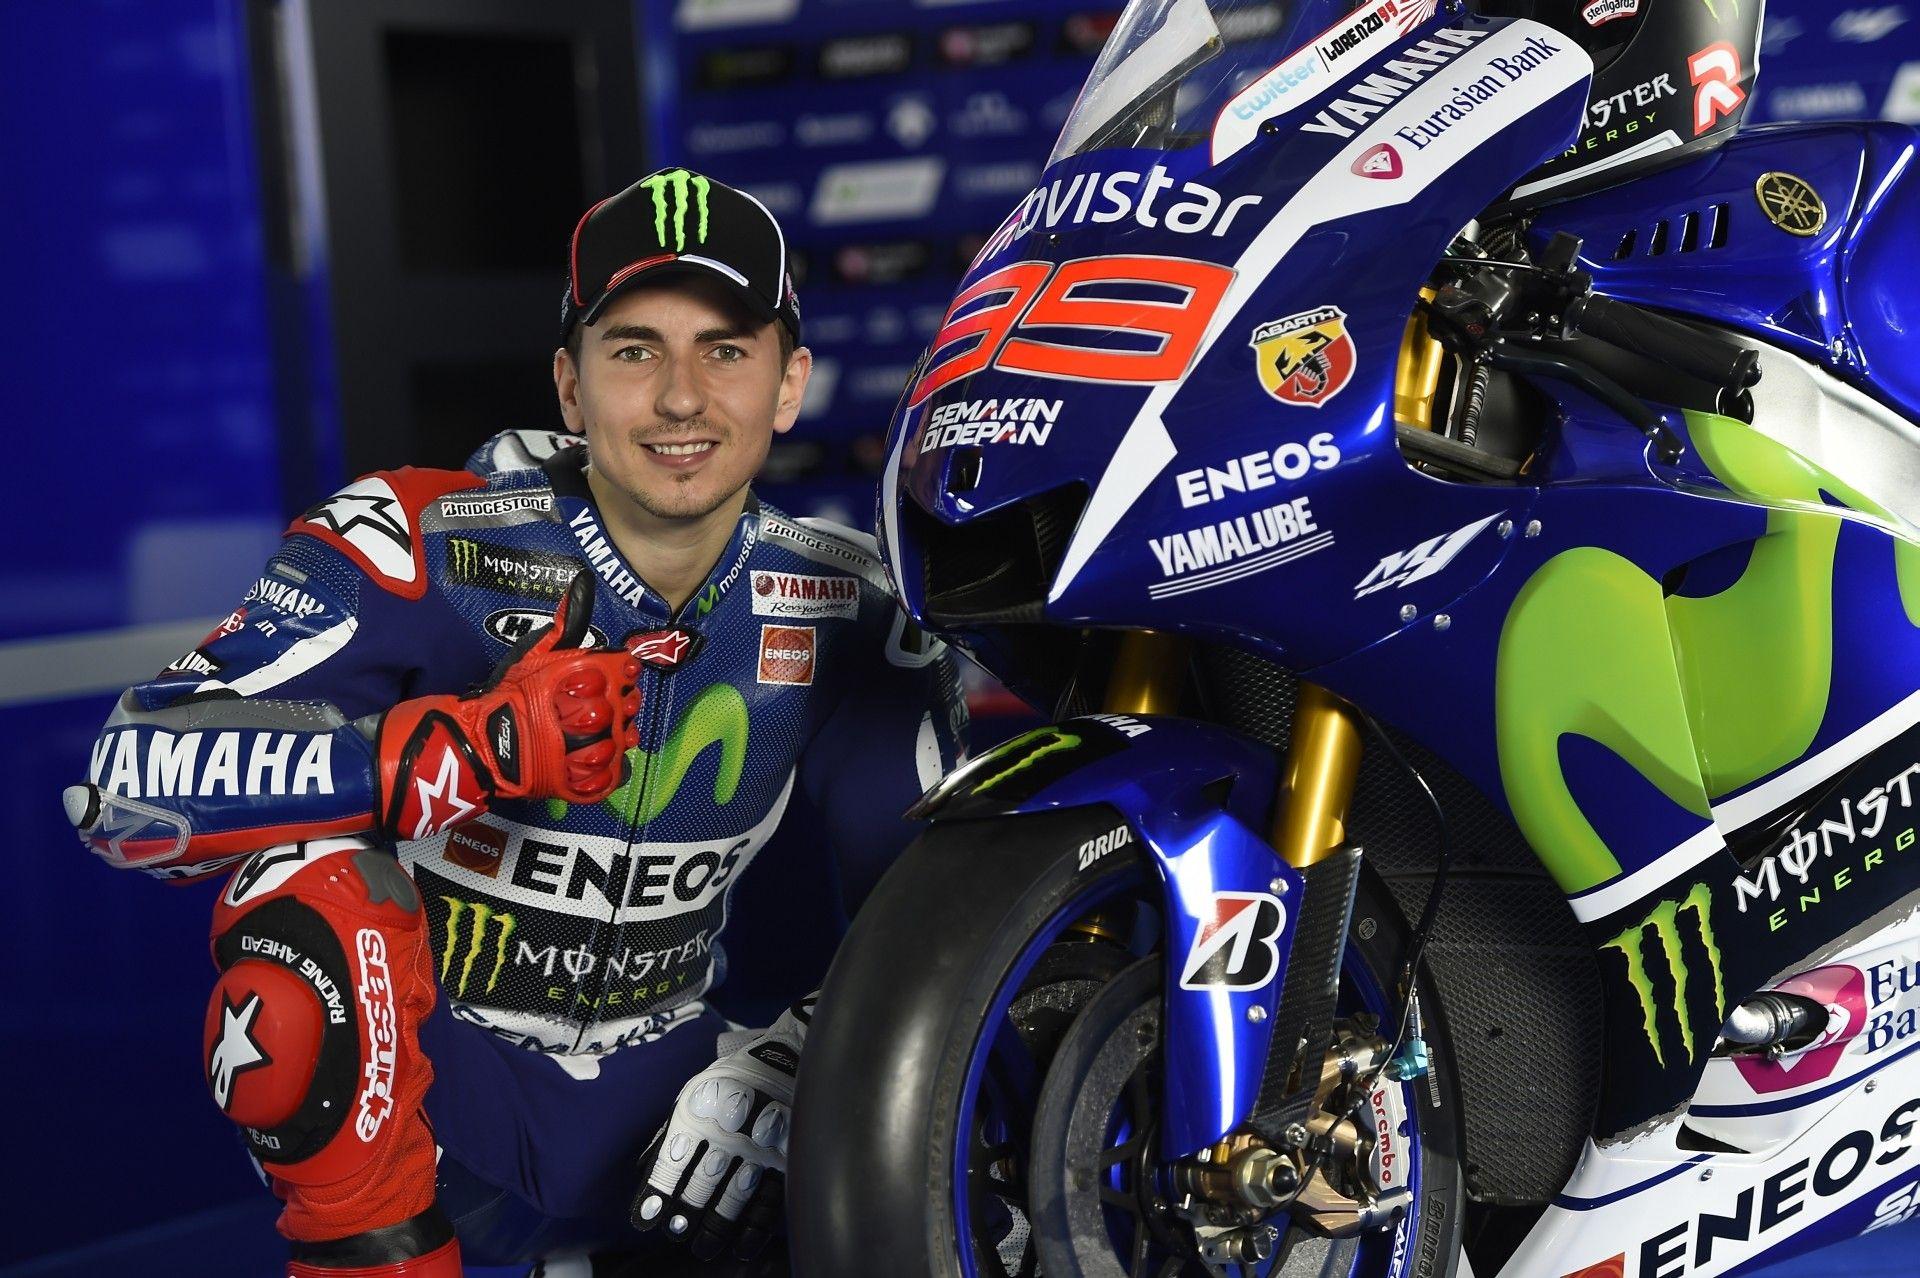 Jorge Lorenzo Motogp 2015 Series Yamaha Motogp Yamaha Motorcycle News